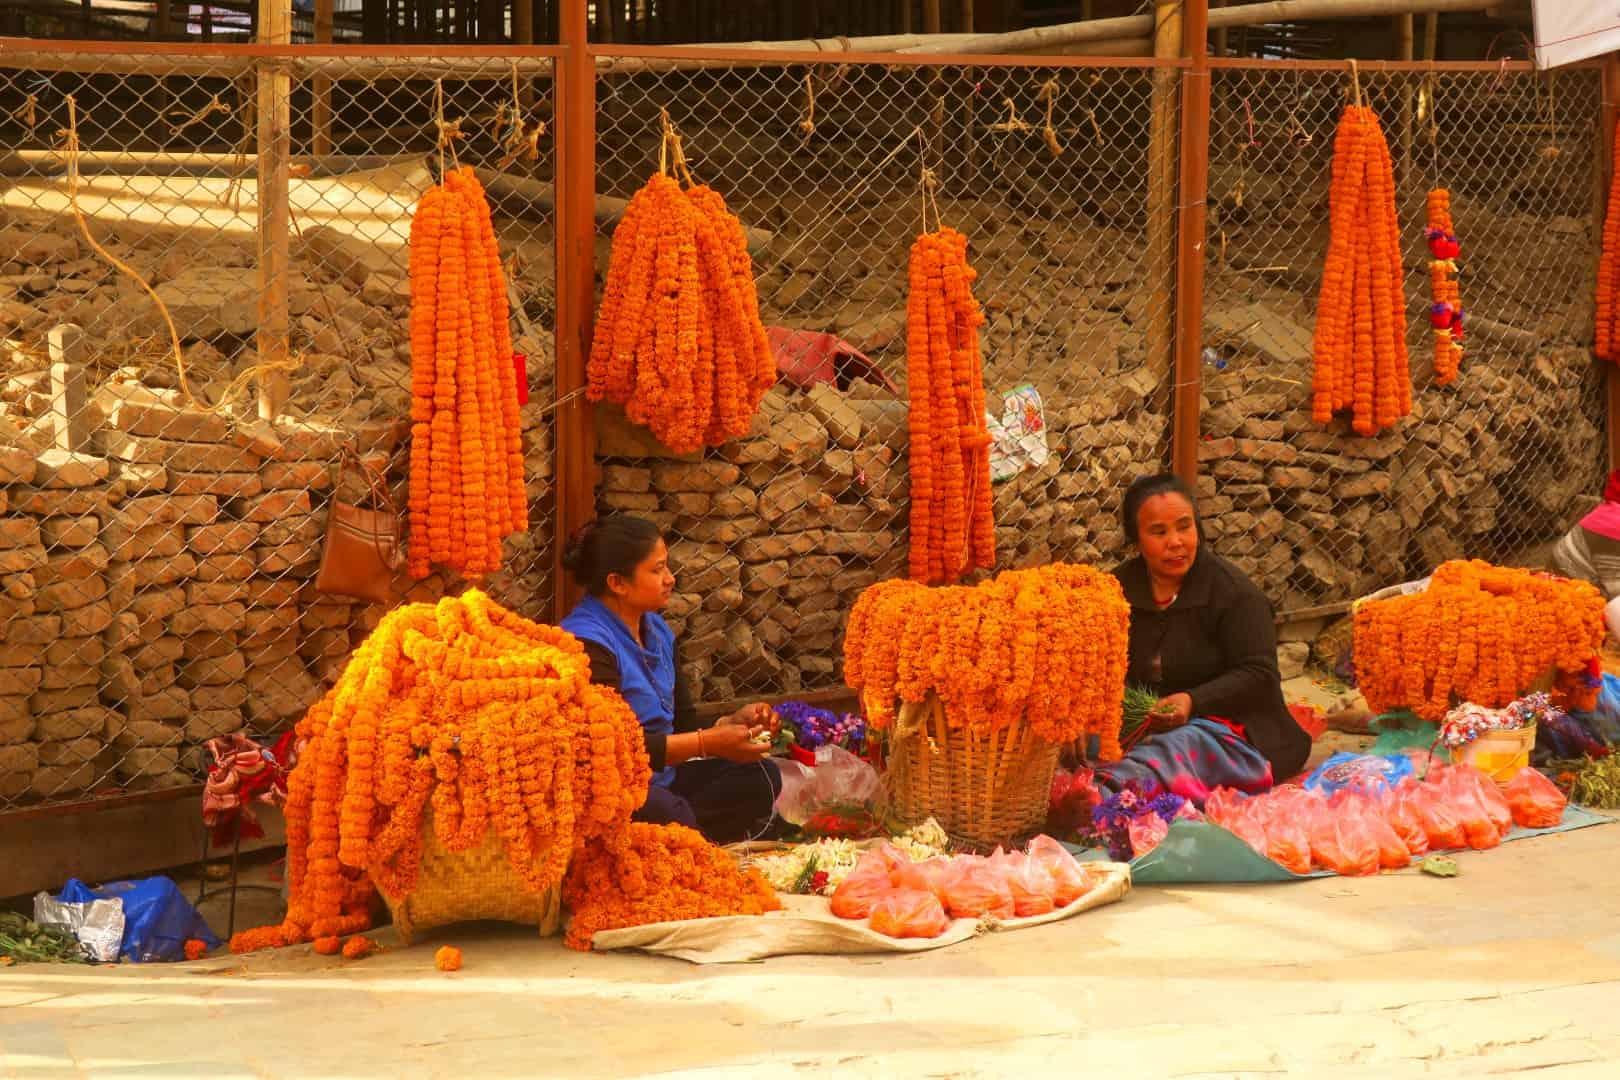 Blumenverkäufer in Kathmandu, Nepal